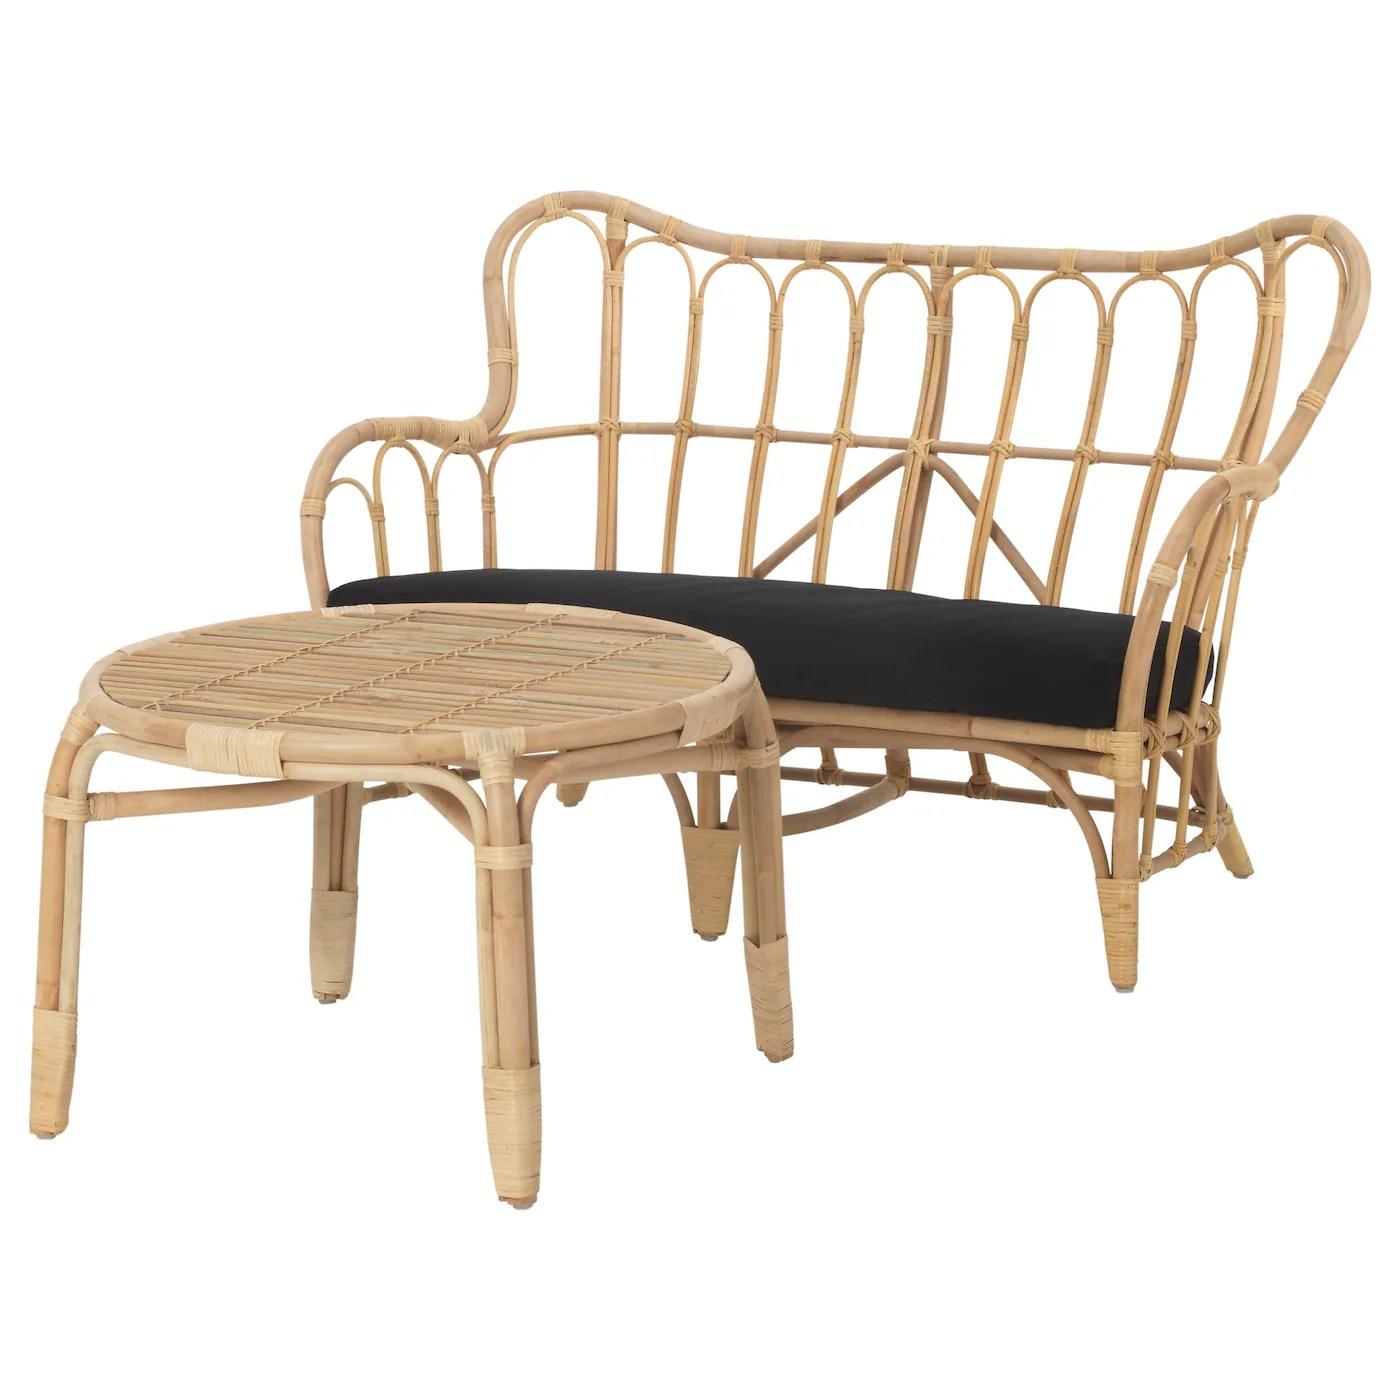 rattan chair ikea wwe ppv souvenir chairs mastholmen 2 seat conversation set outdoor